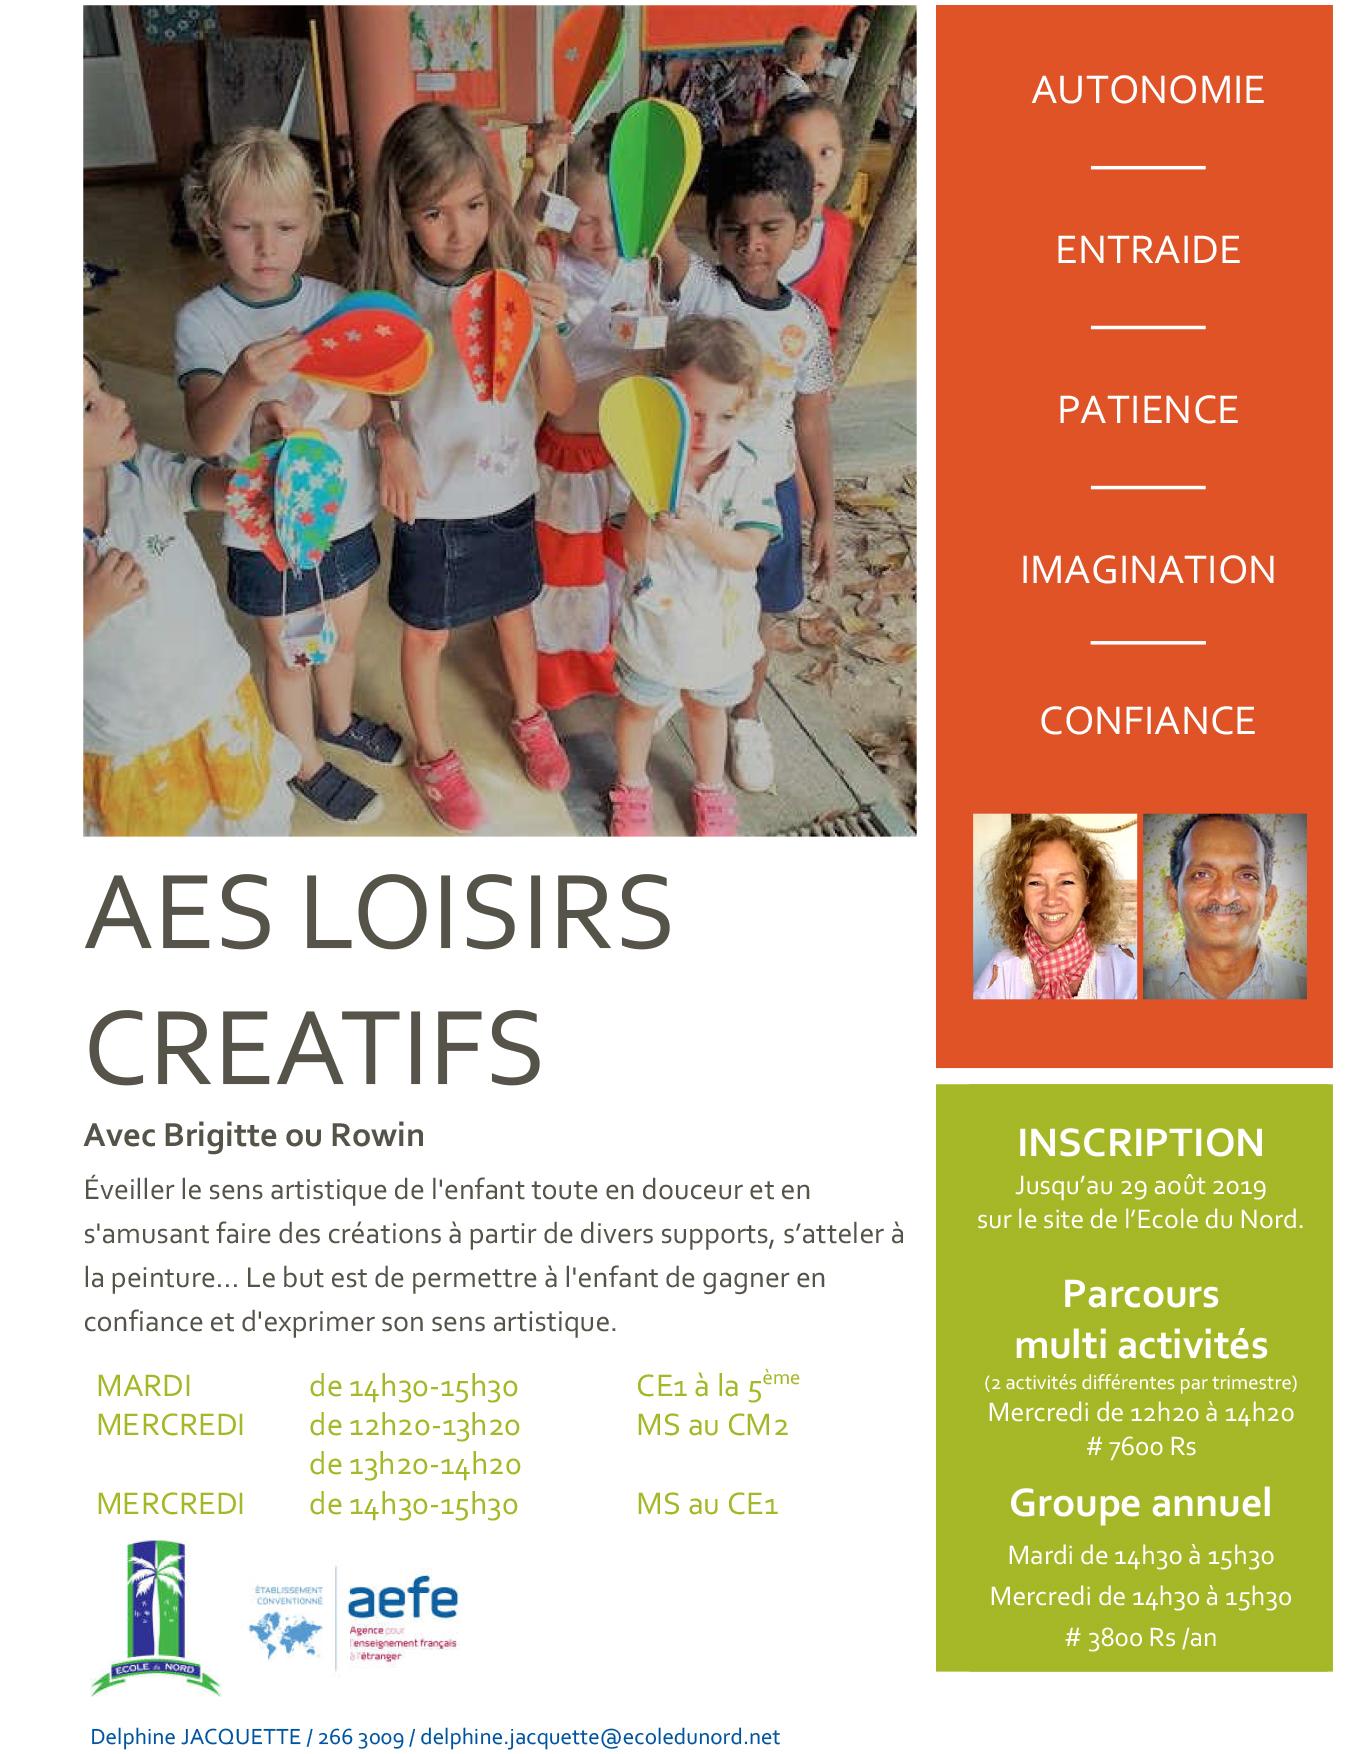 AES 2019-2020 fiches-57 copie